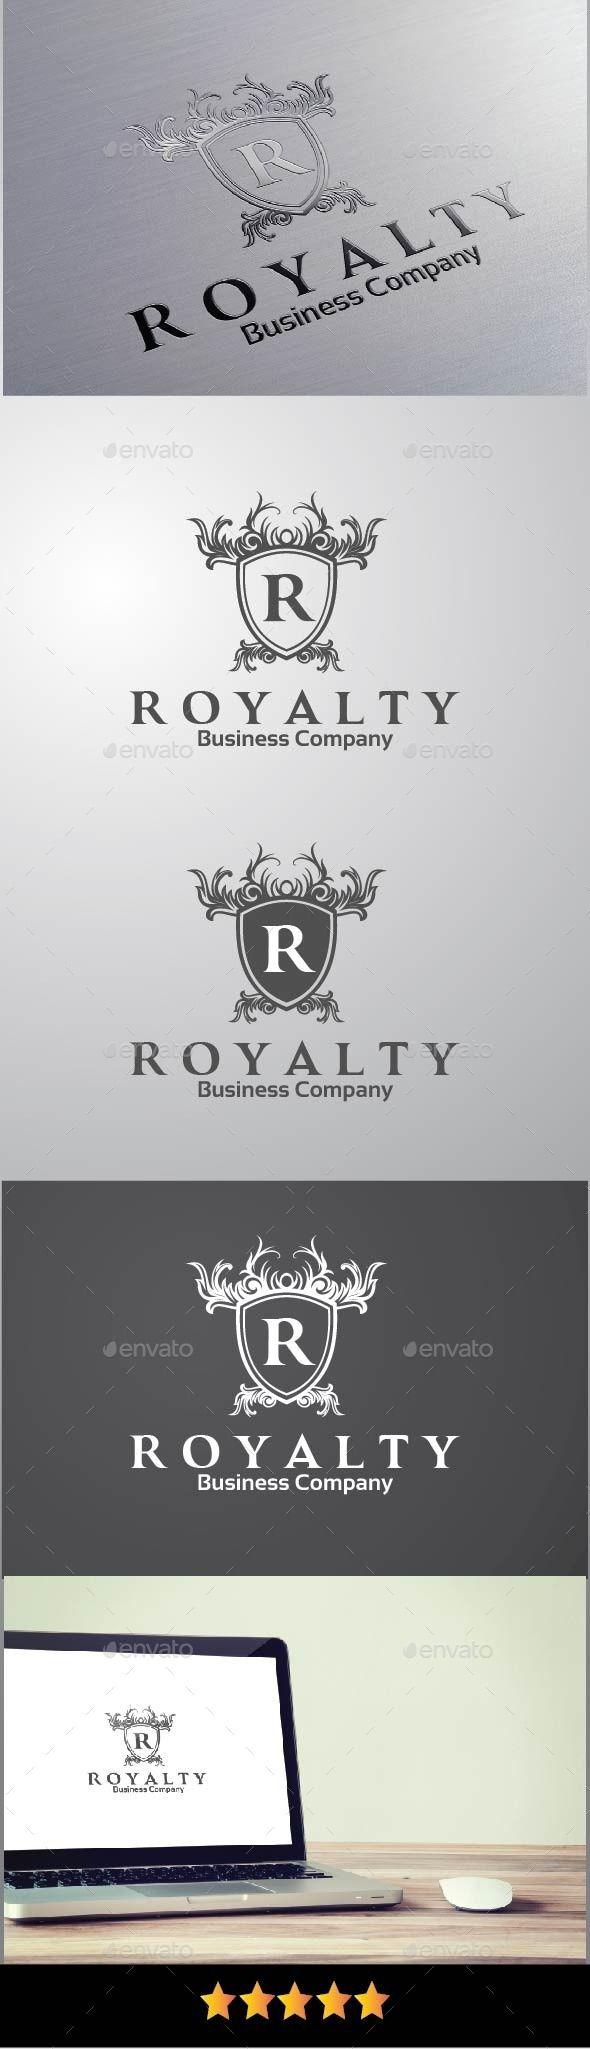 Royality Logo Royal logo, Jewelry logo, Three letter logos